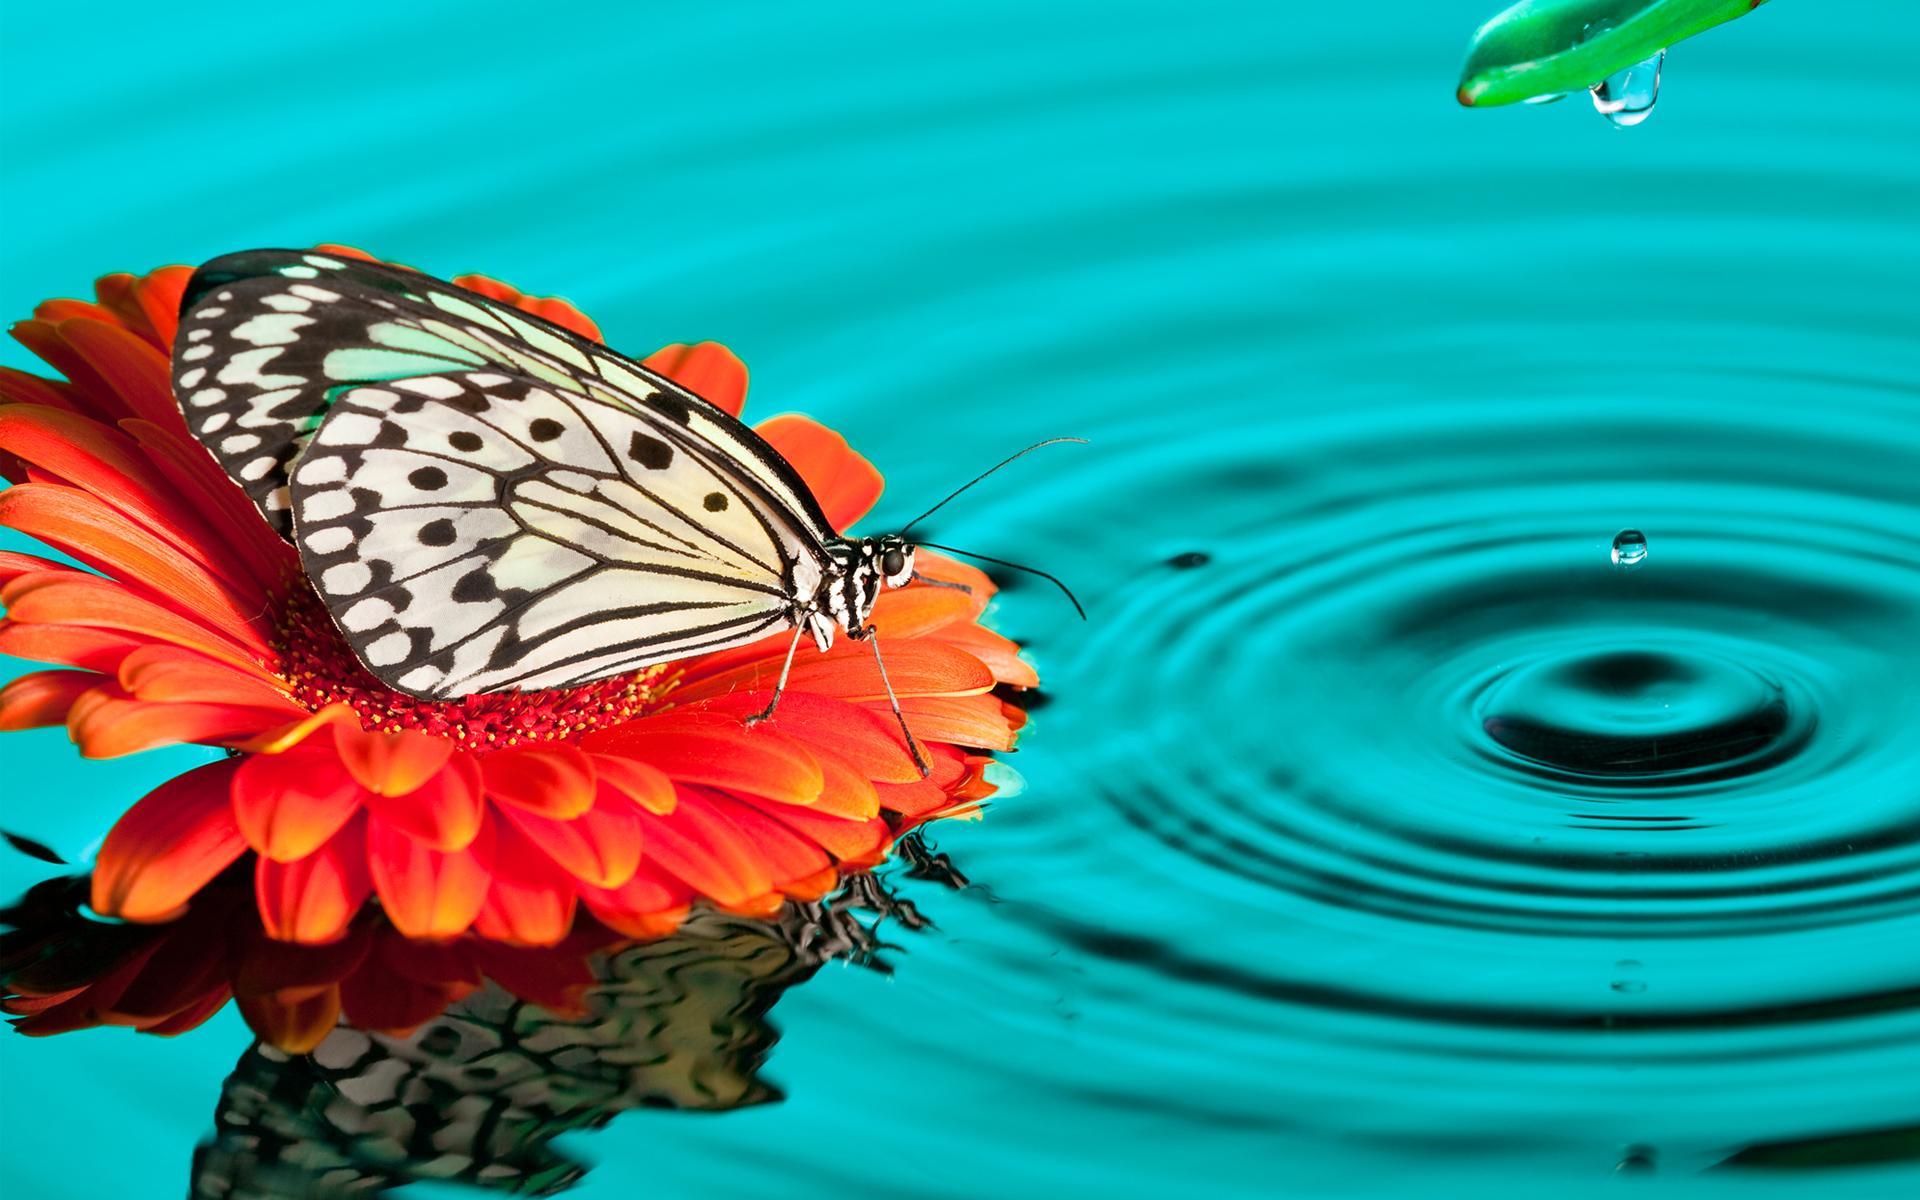 HD Wallpapers Butterfly Drops